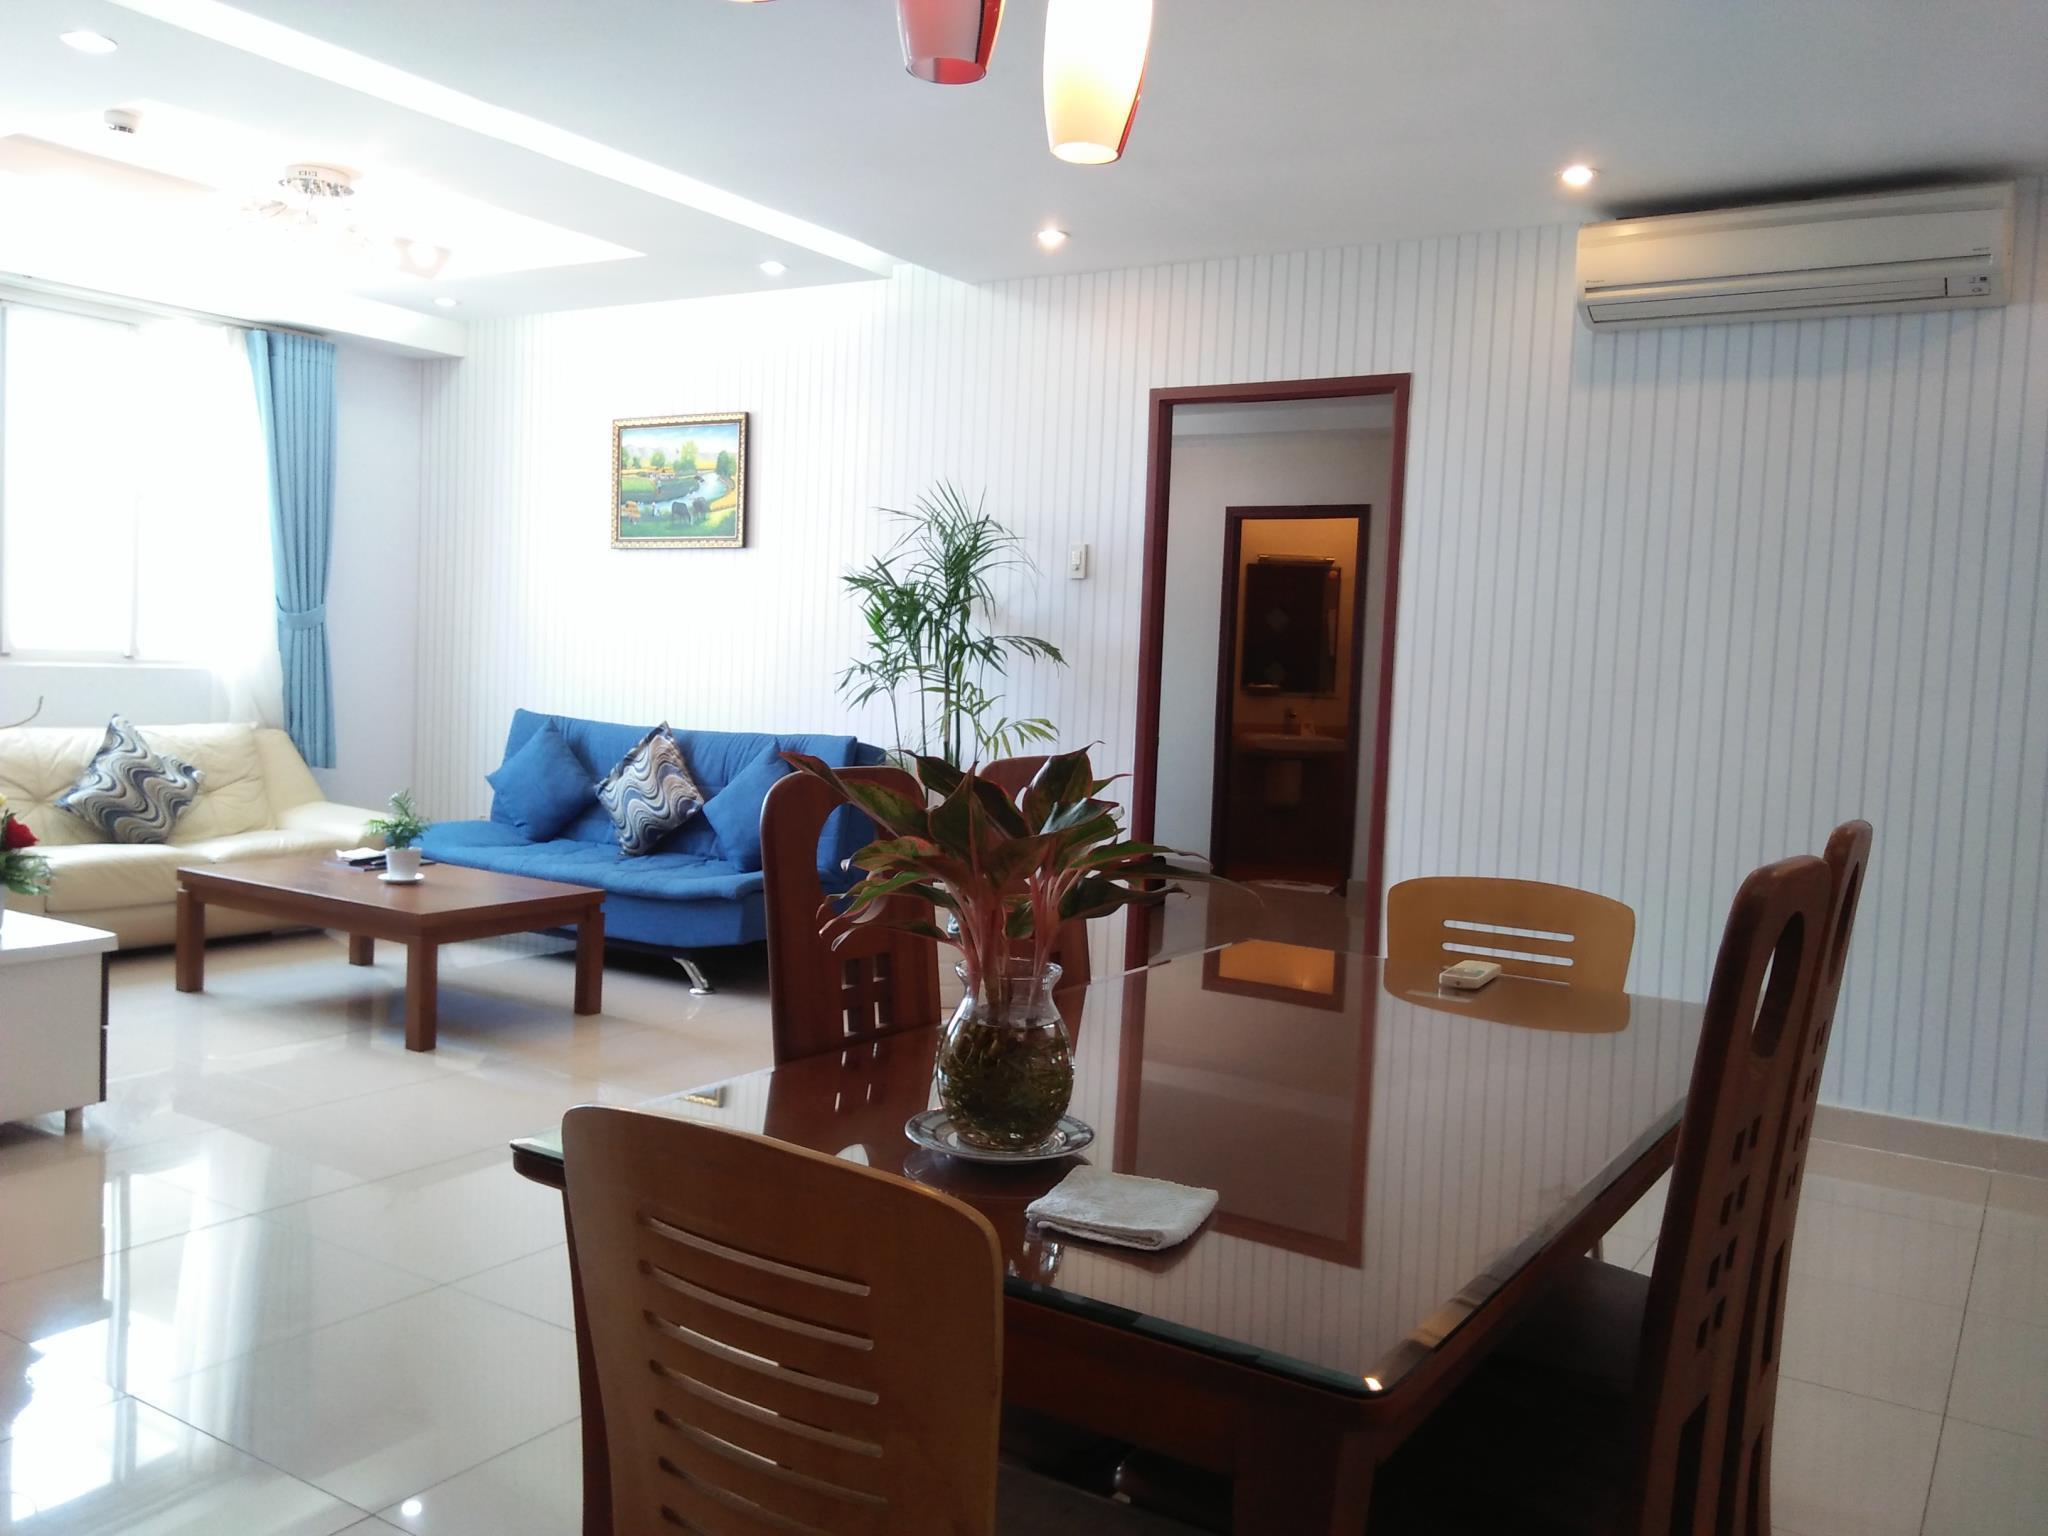 343 Pham Ngu Lao Serviced Apartment